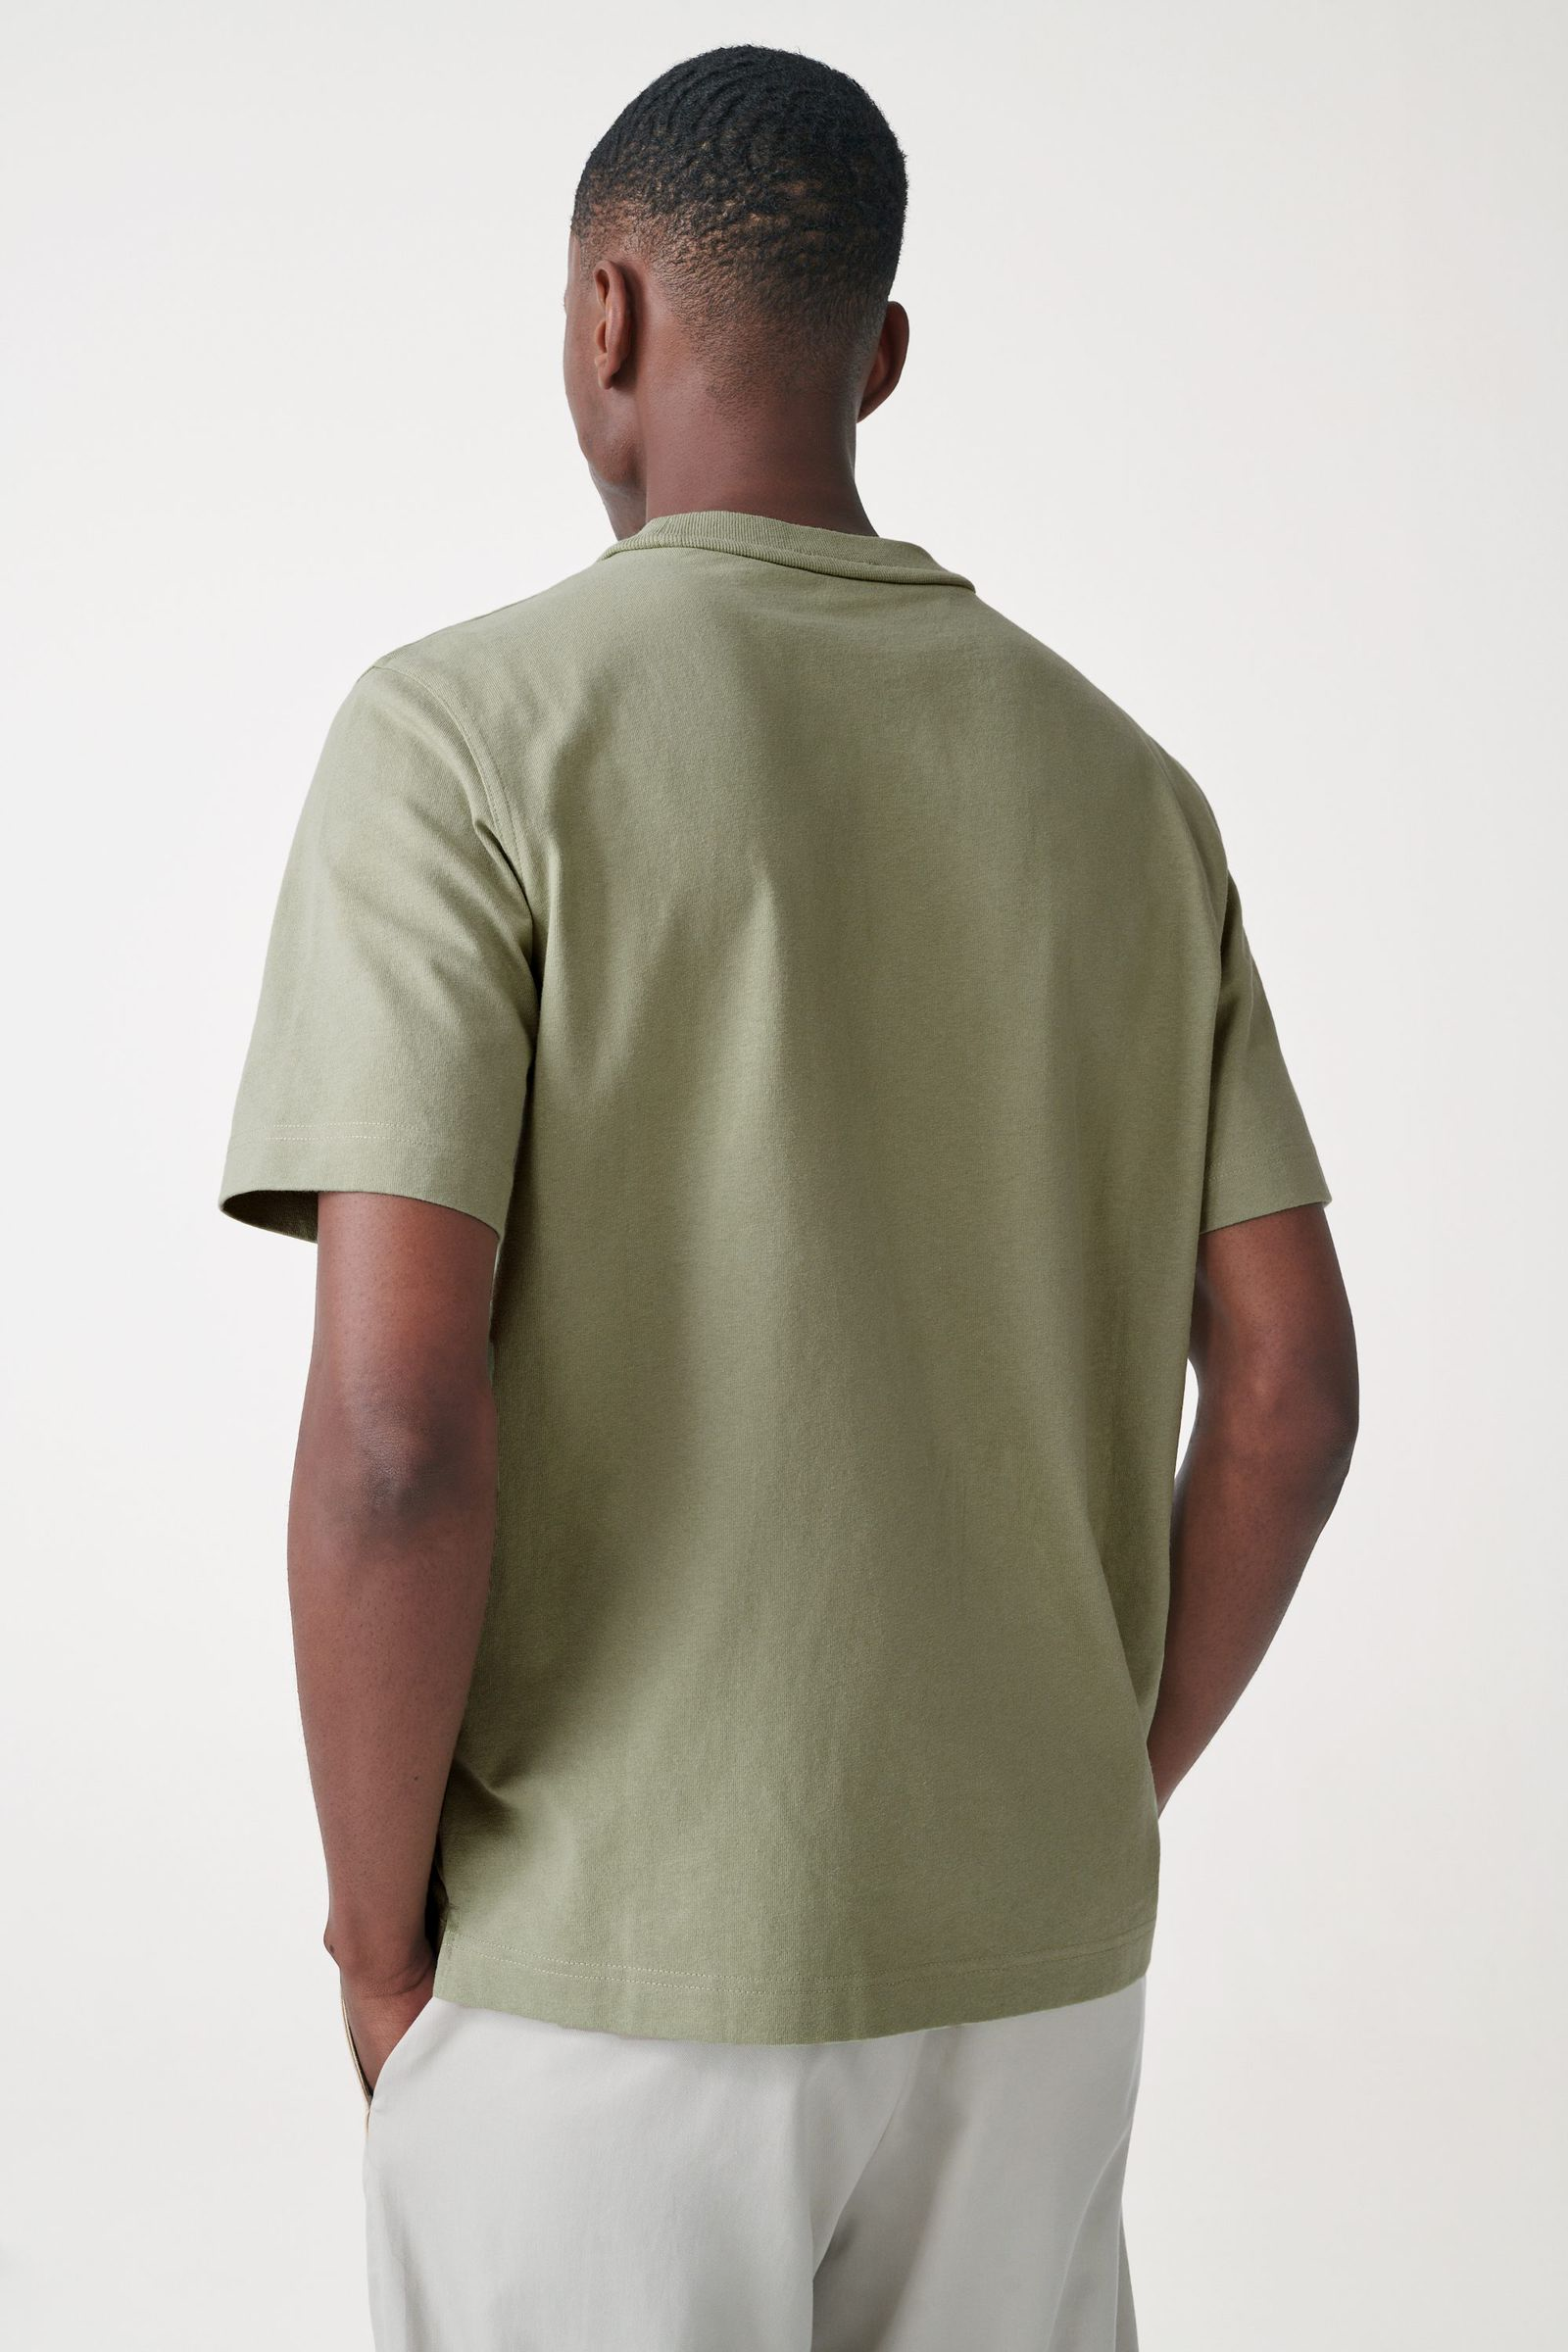 COS 오가닉 코튼 오버사이즈 슬리브 티셔츠의 카키컬러 ECOMLook입니다.